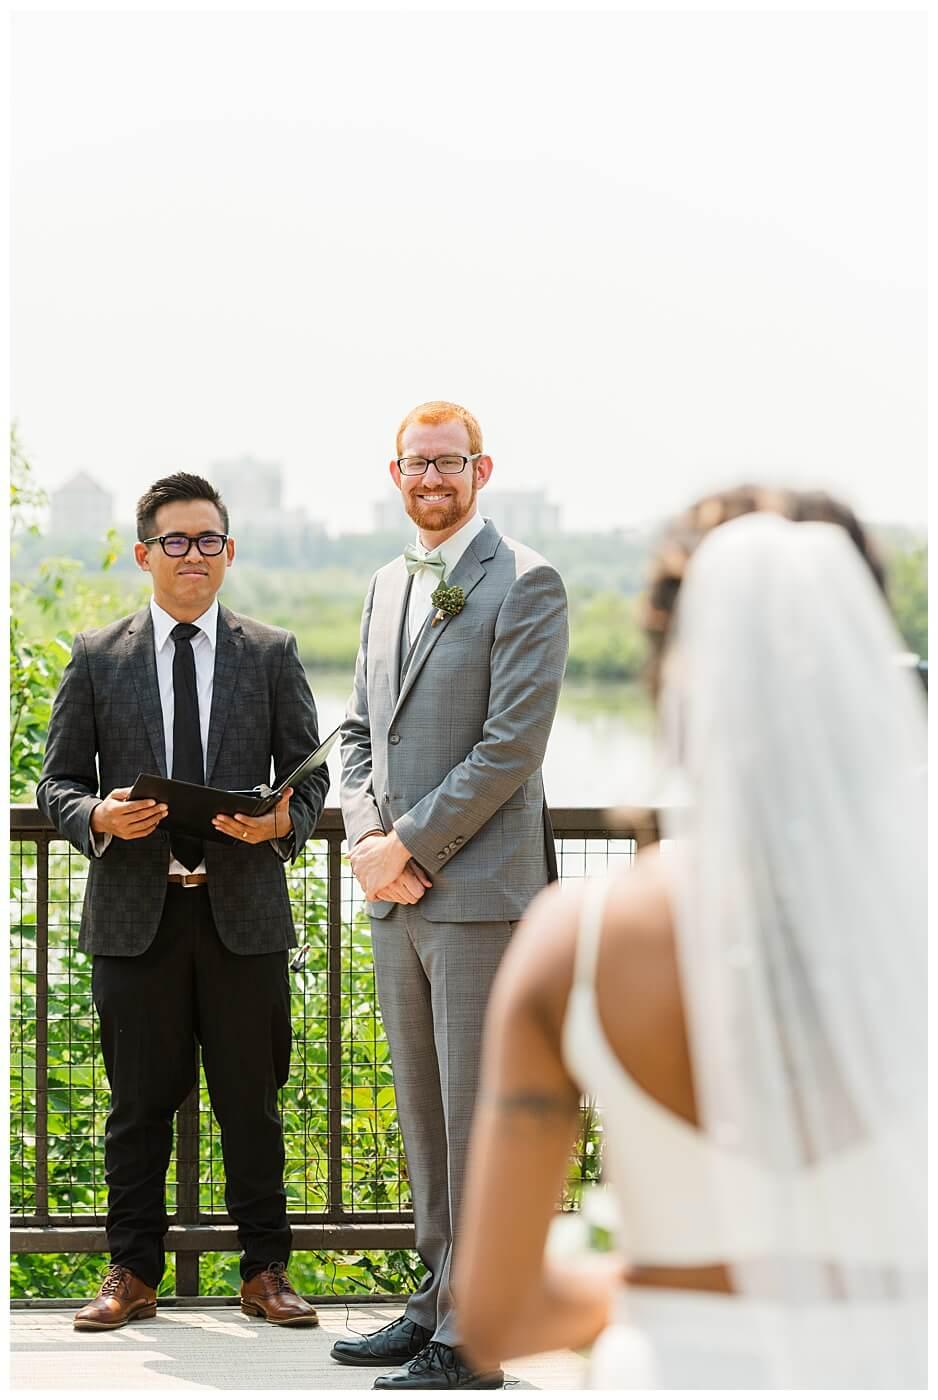 Stephen & Sarah Wedding - 09 - Bride processional toward groom at Wascana Park overlook